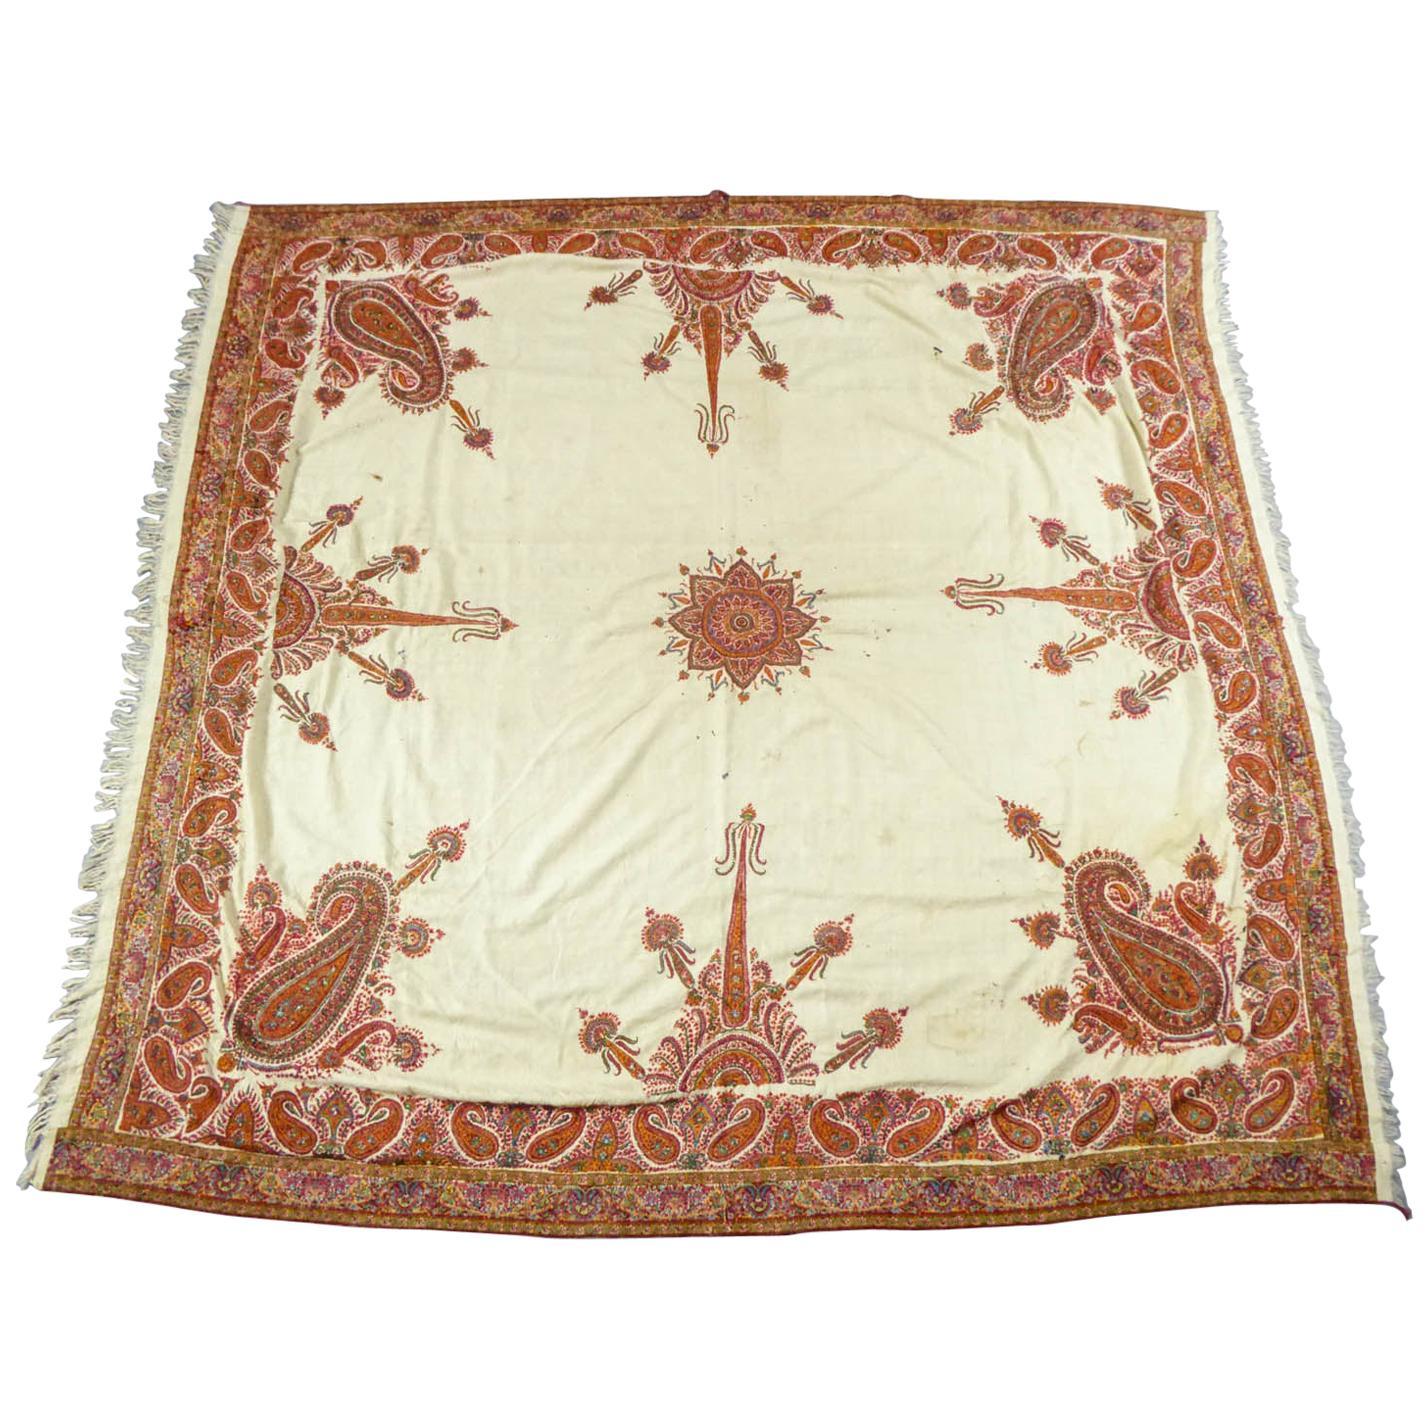 Squared Indian Embroidered Kashmir Shawl Circa 1870